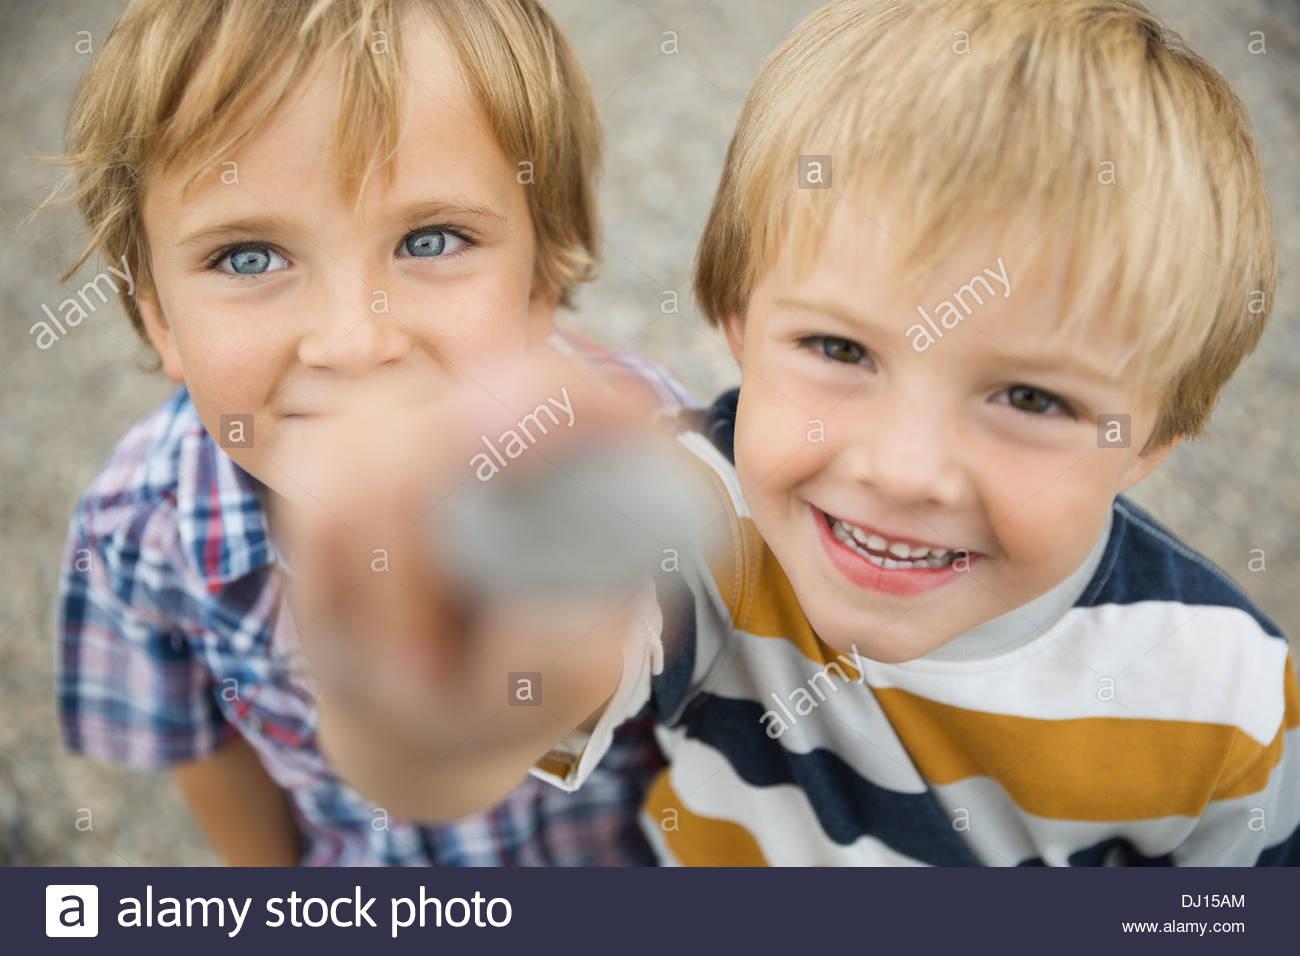 Bilder süße jungs